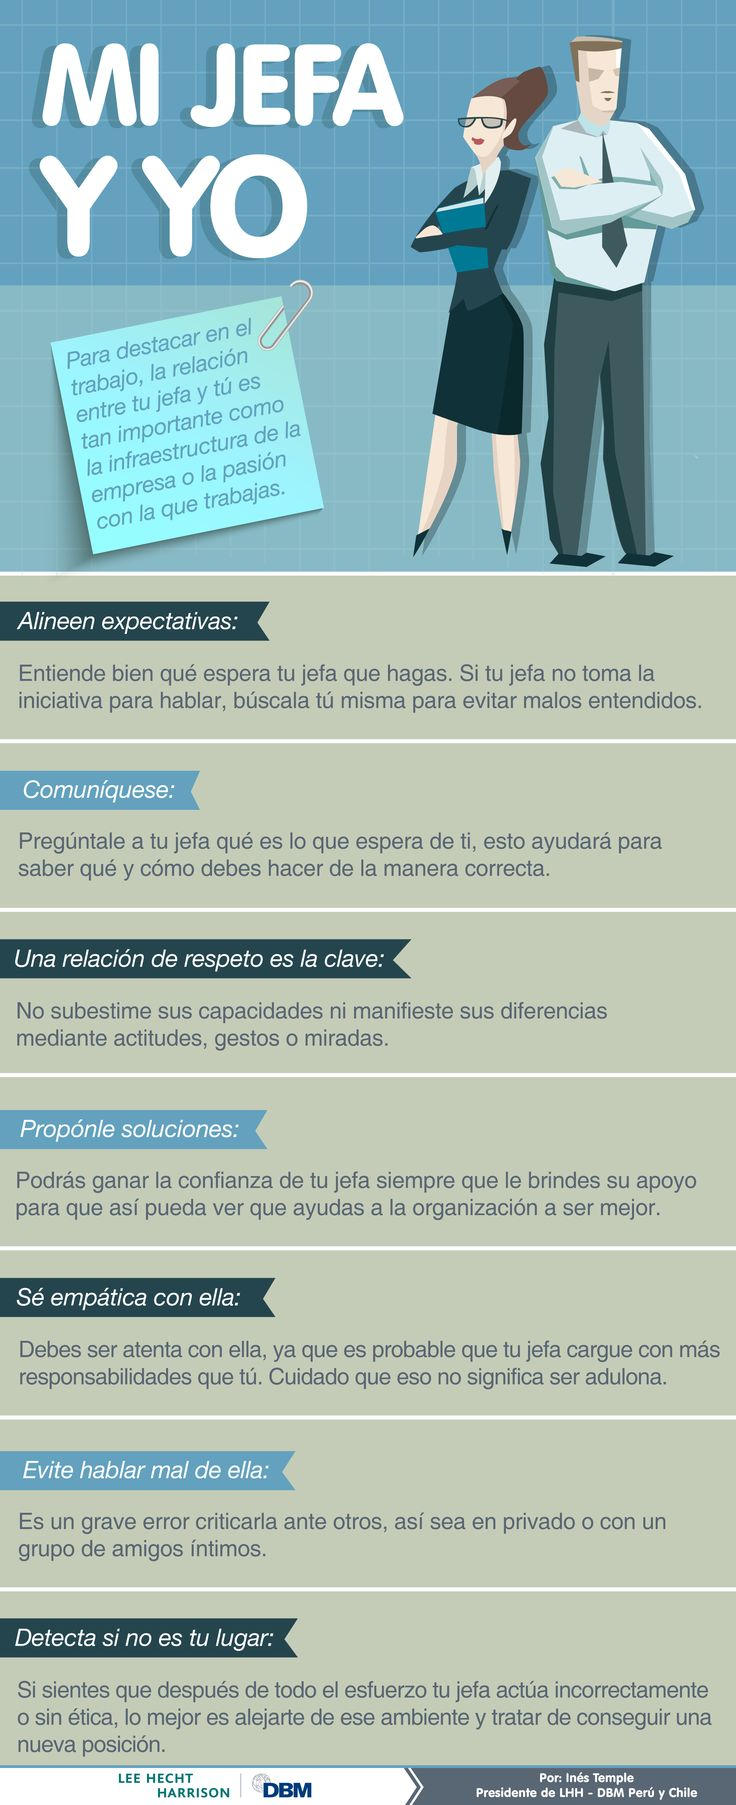 55 best Infografías images on Pinterest   Anuncios, Buscando y Busco ...